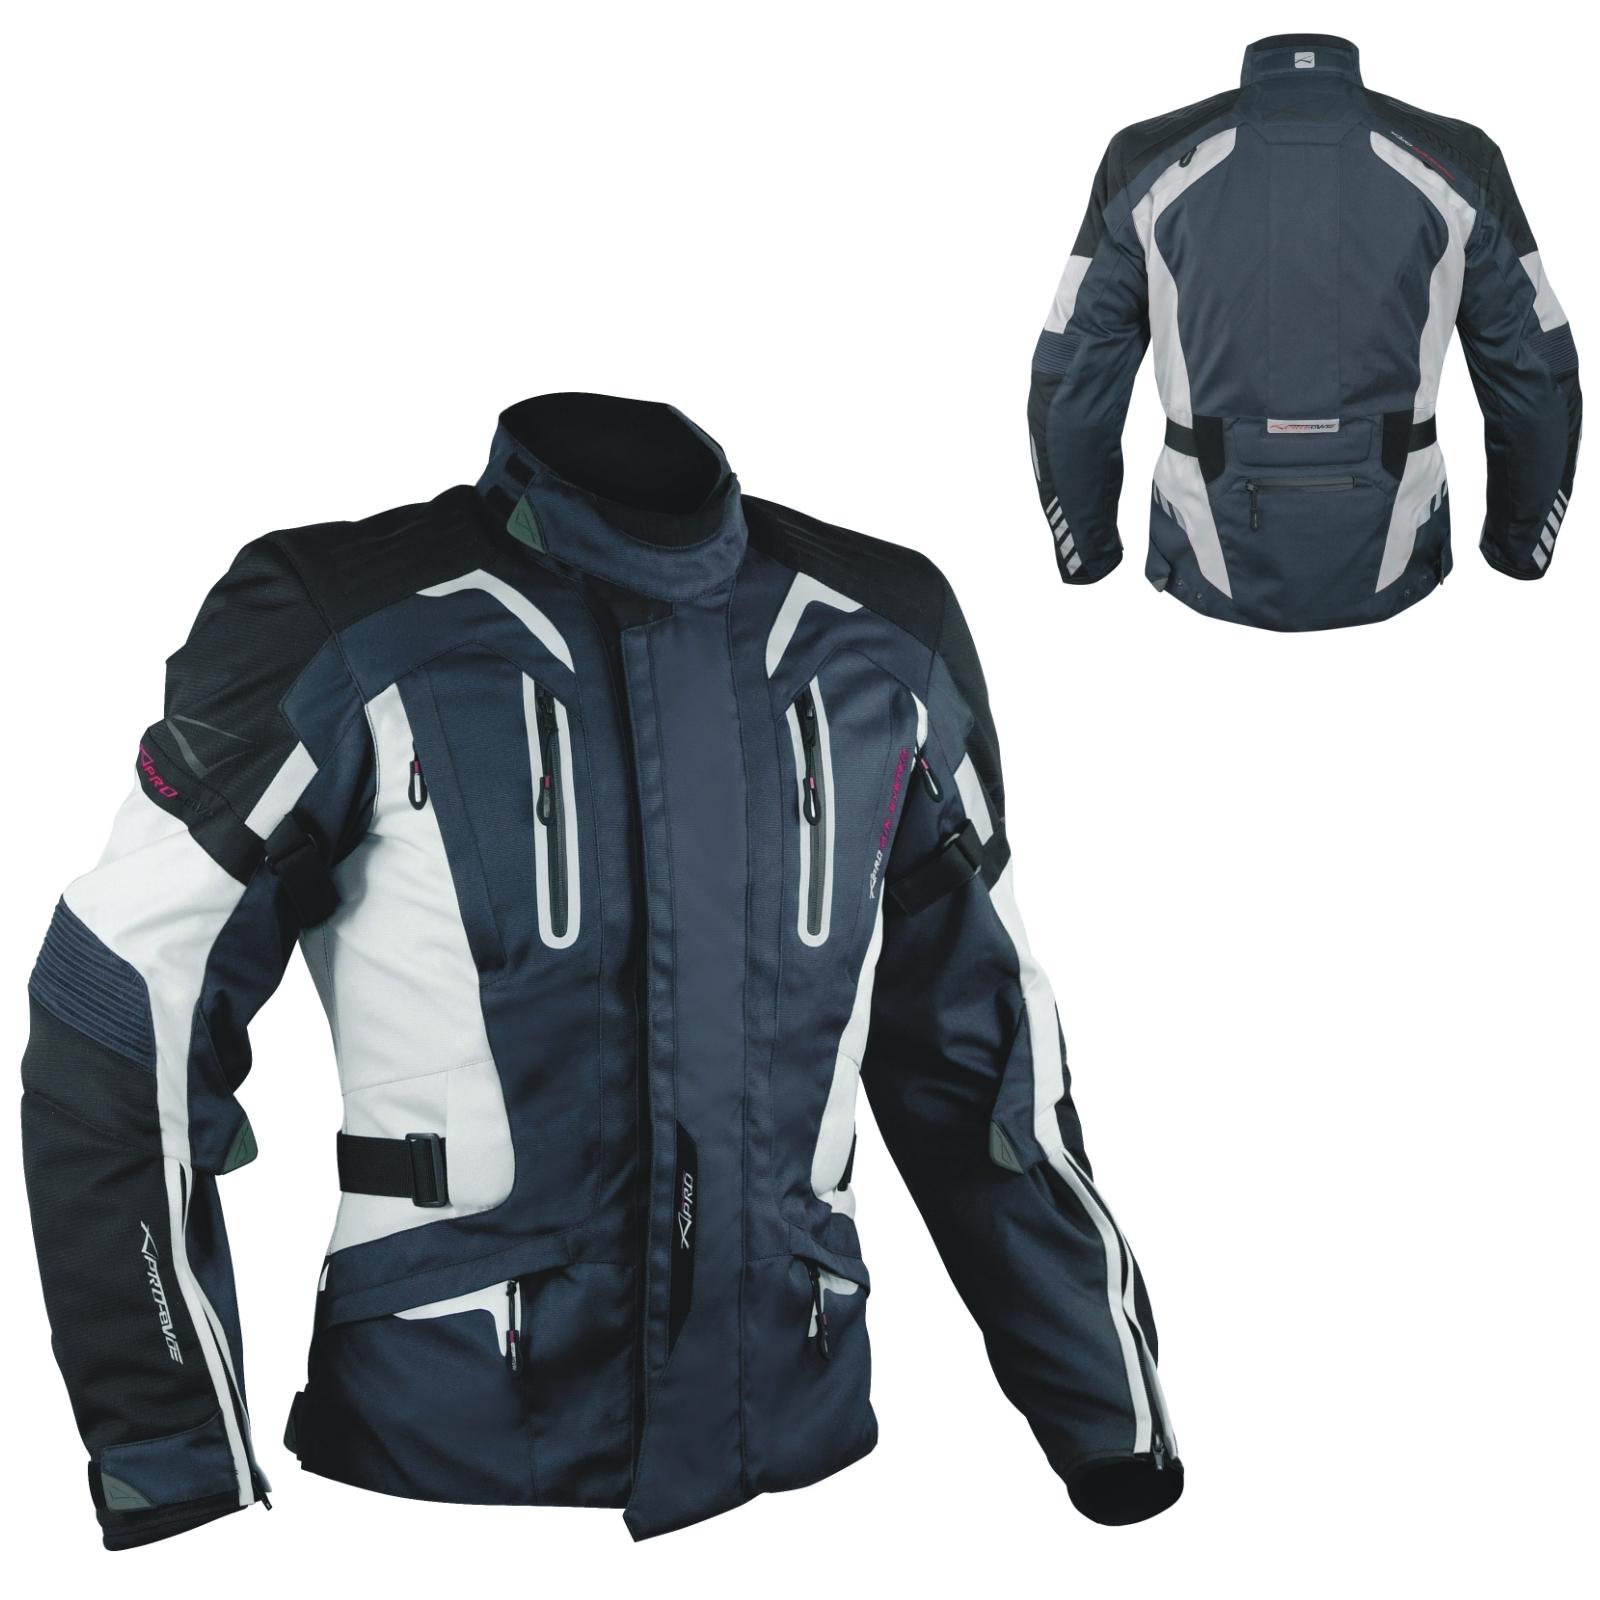 Blouson-Moto-Tissu-Veste-Impermeable-Doublure-Hivernale-Reflechissant-Respirant miniature 10